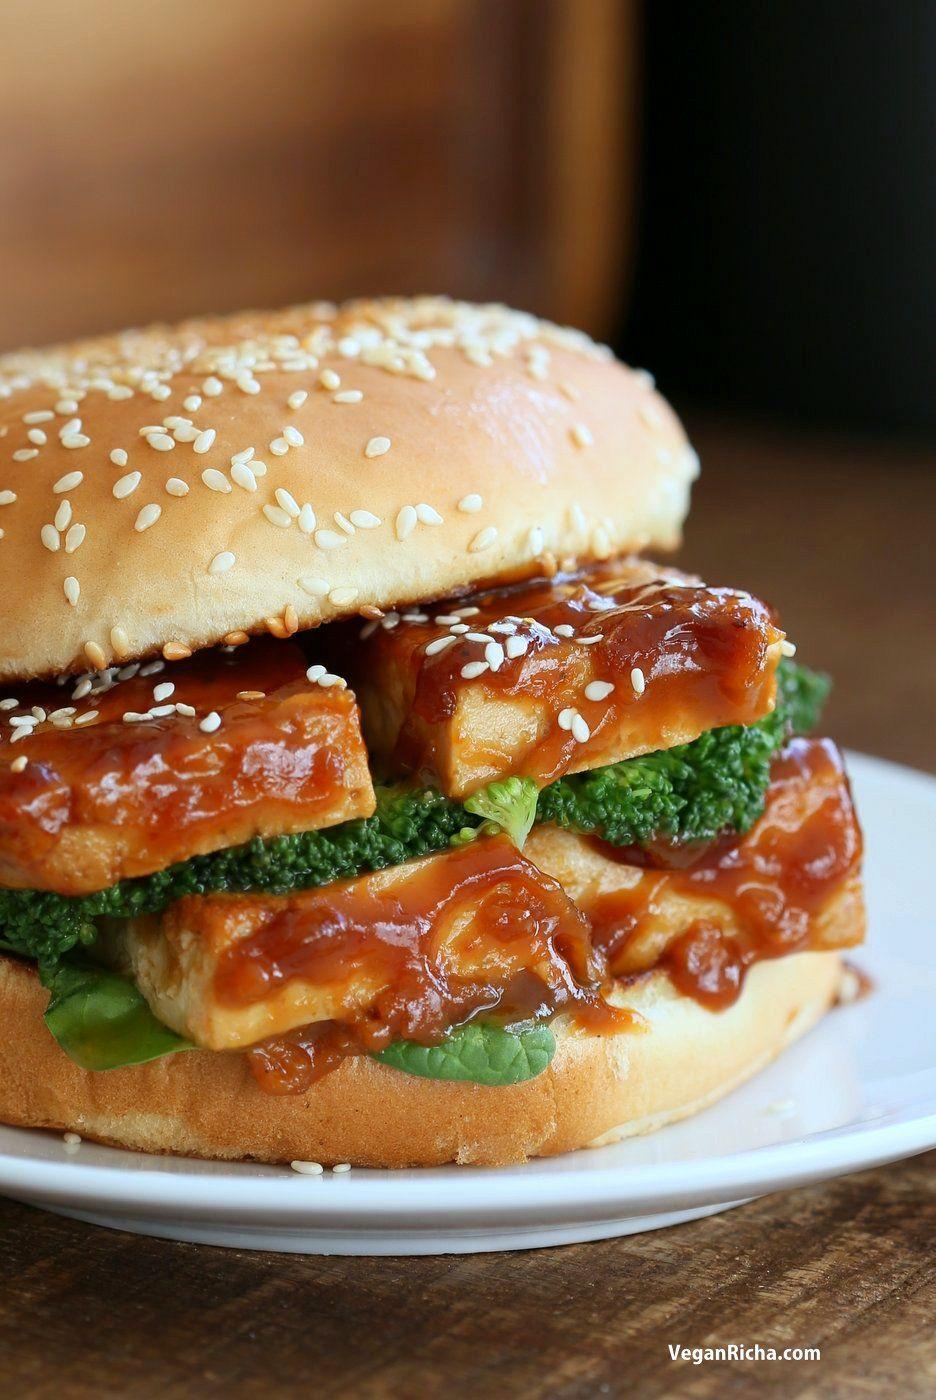 General Tso's Tofu Sandwich. Vegan General Tso Sauce Recipe. Bake the tofu or pan fry, add blanched veggies and make a sandwich or wrap. Vegan Nut-free Recipe. can be gluten-free with gf buns or wrap. | VeganRicha.com